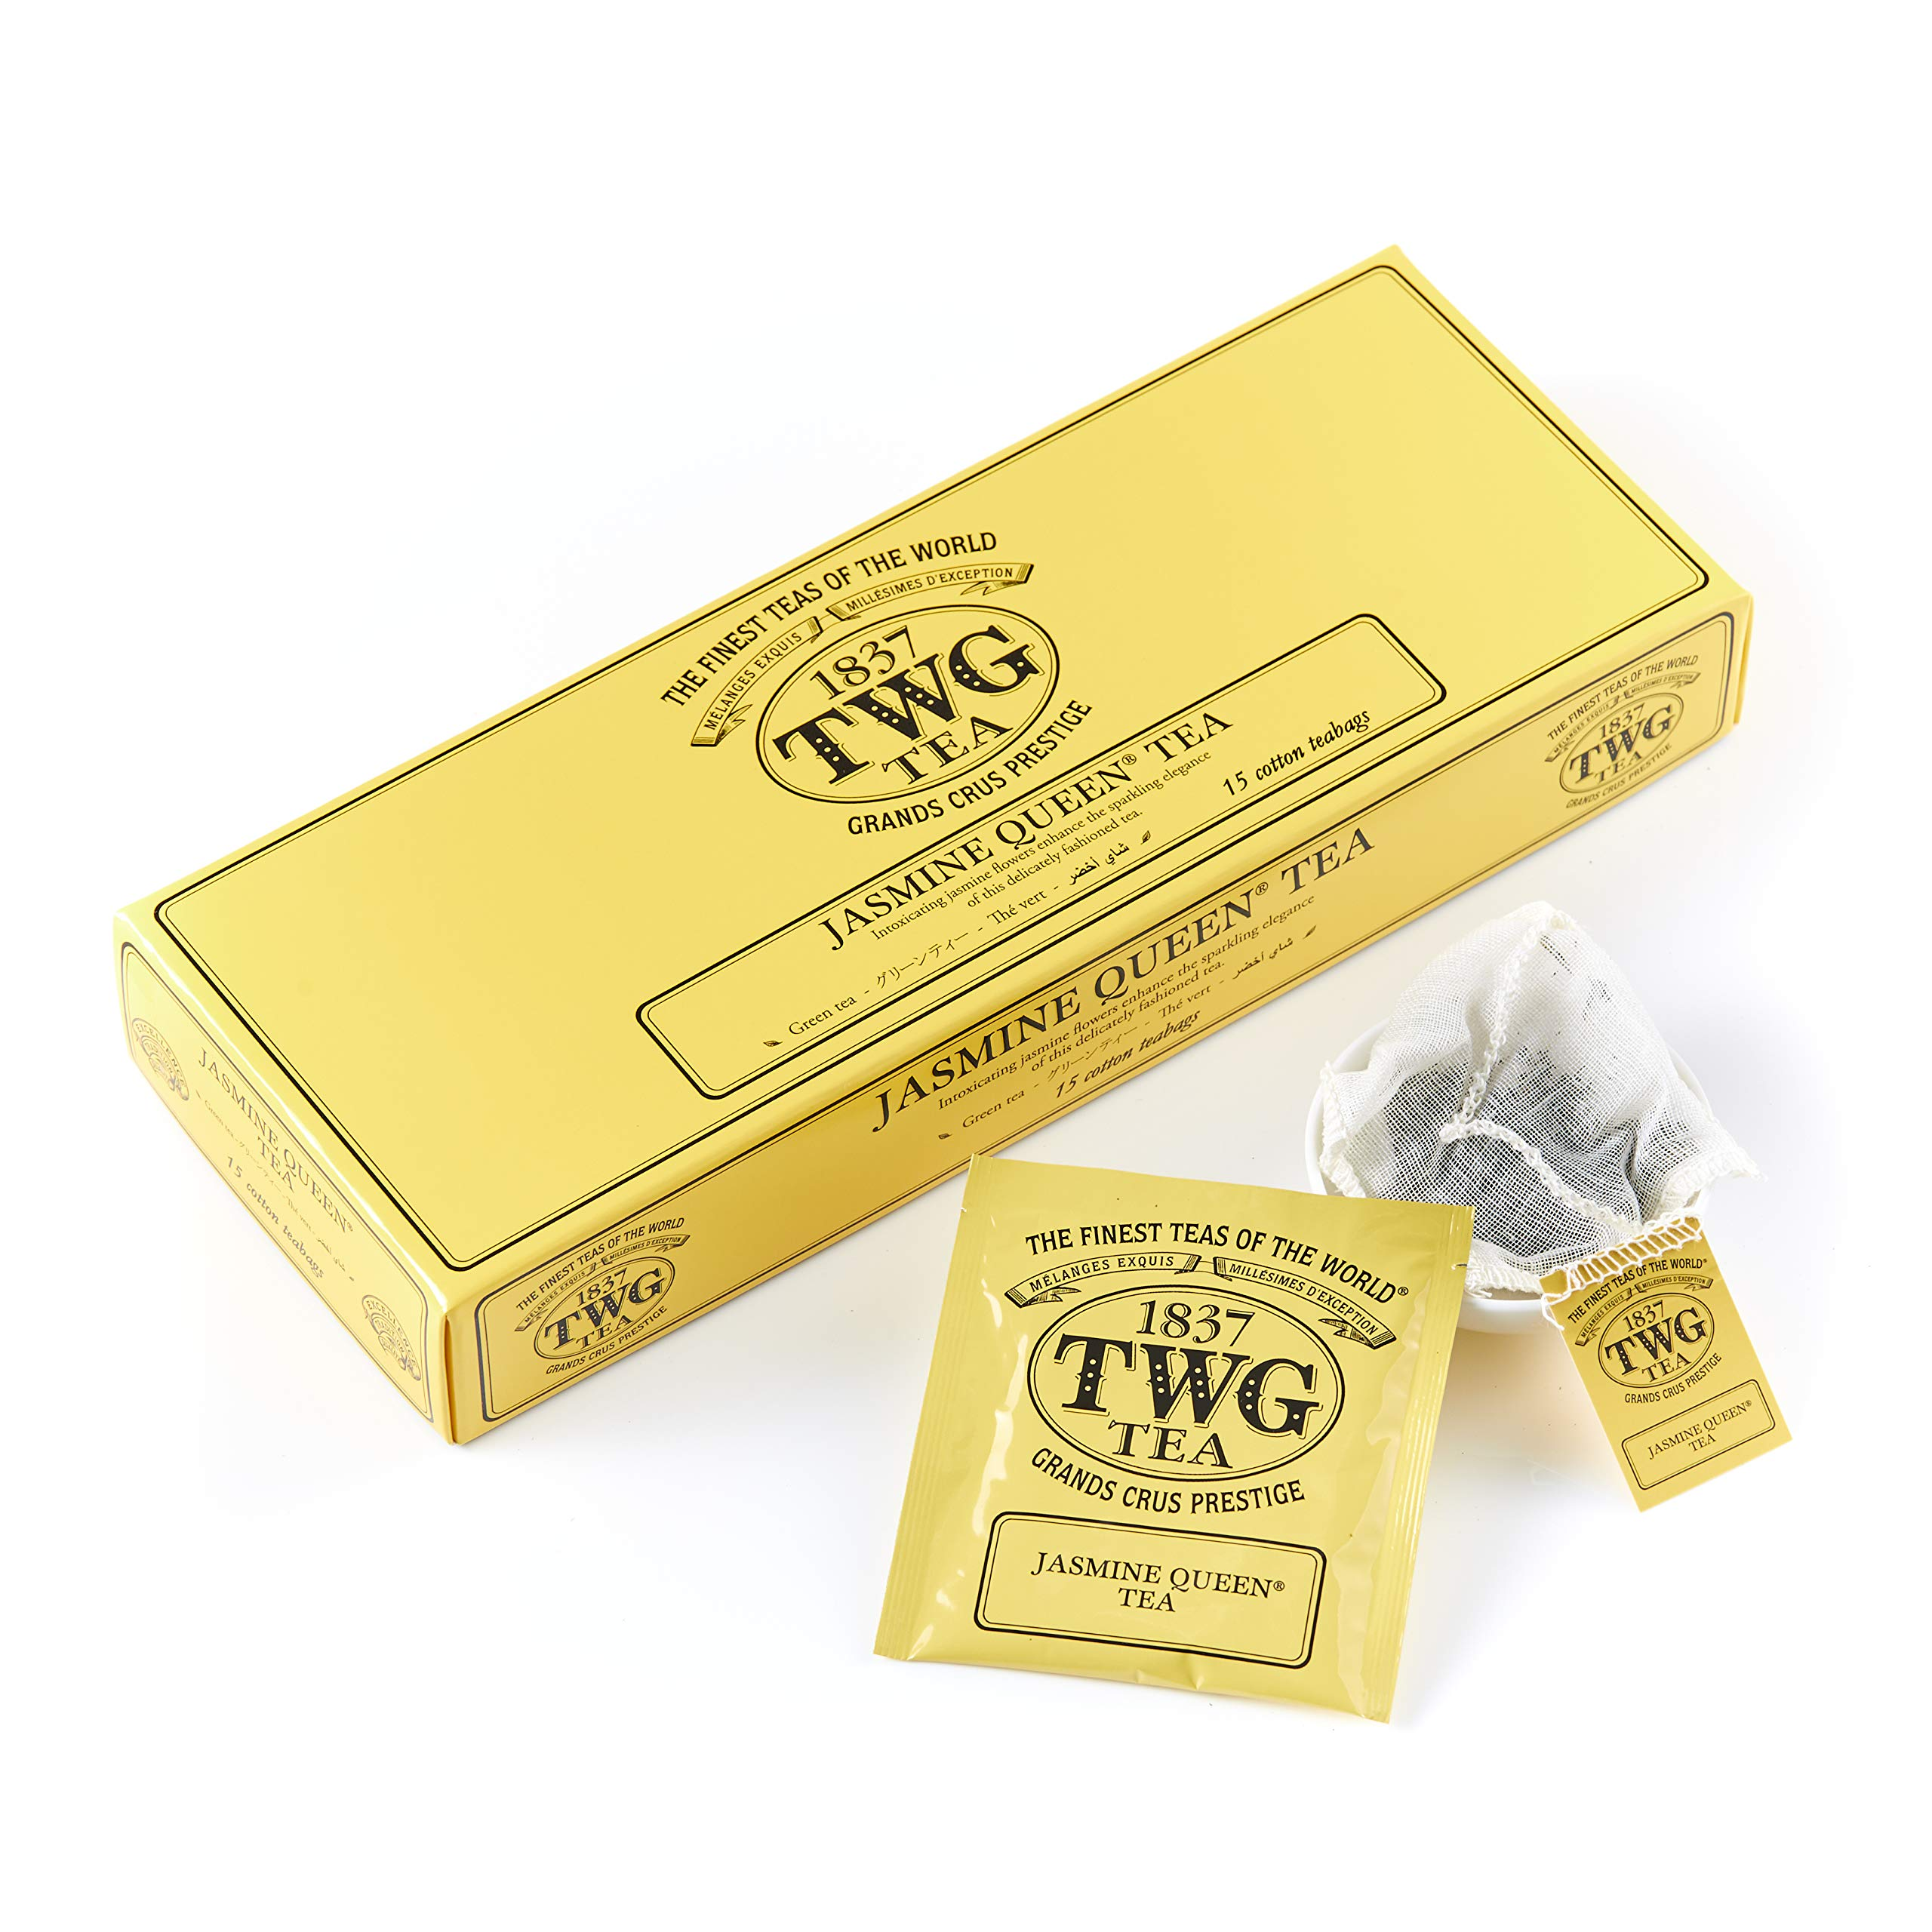 TWG Singapore - Luxury Teas - JASMINE QUEEN GREEN TEA - 15 Hand sewn pure cotton tea bags